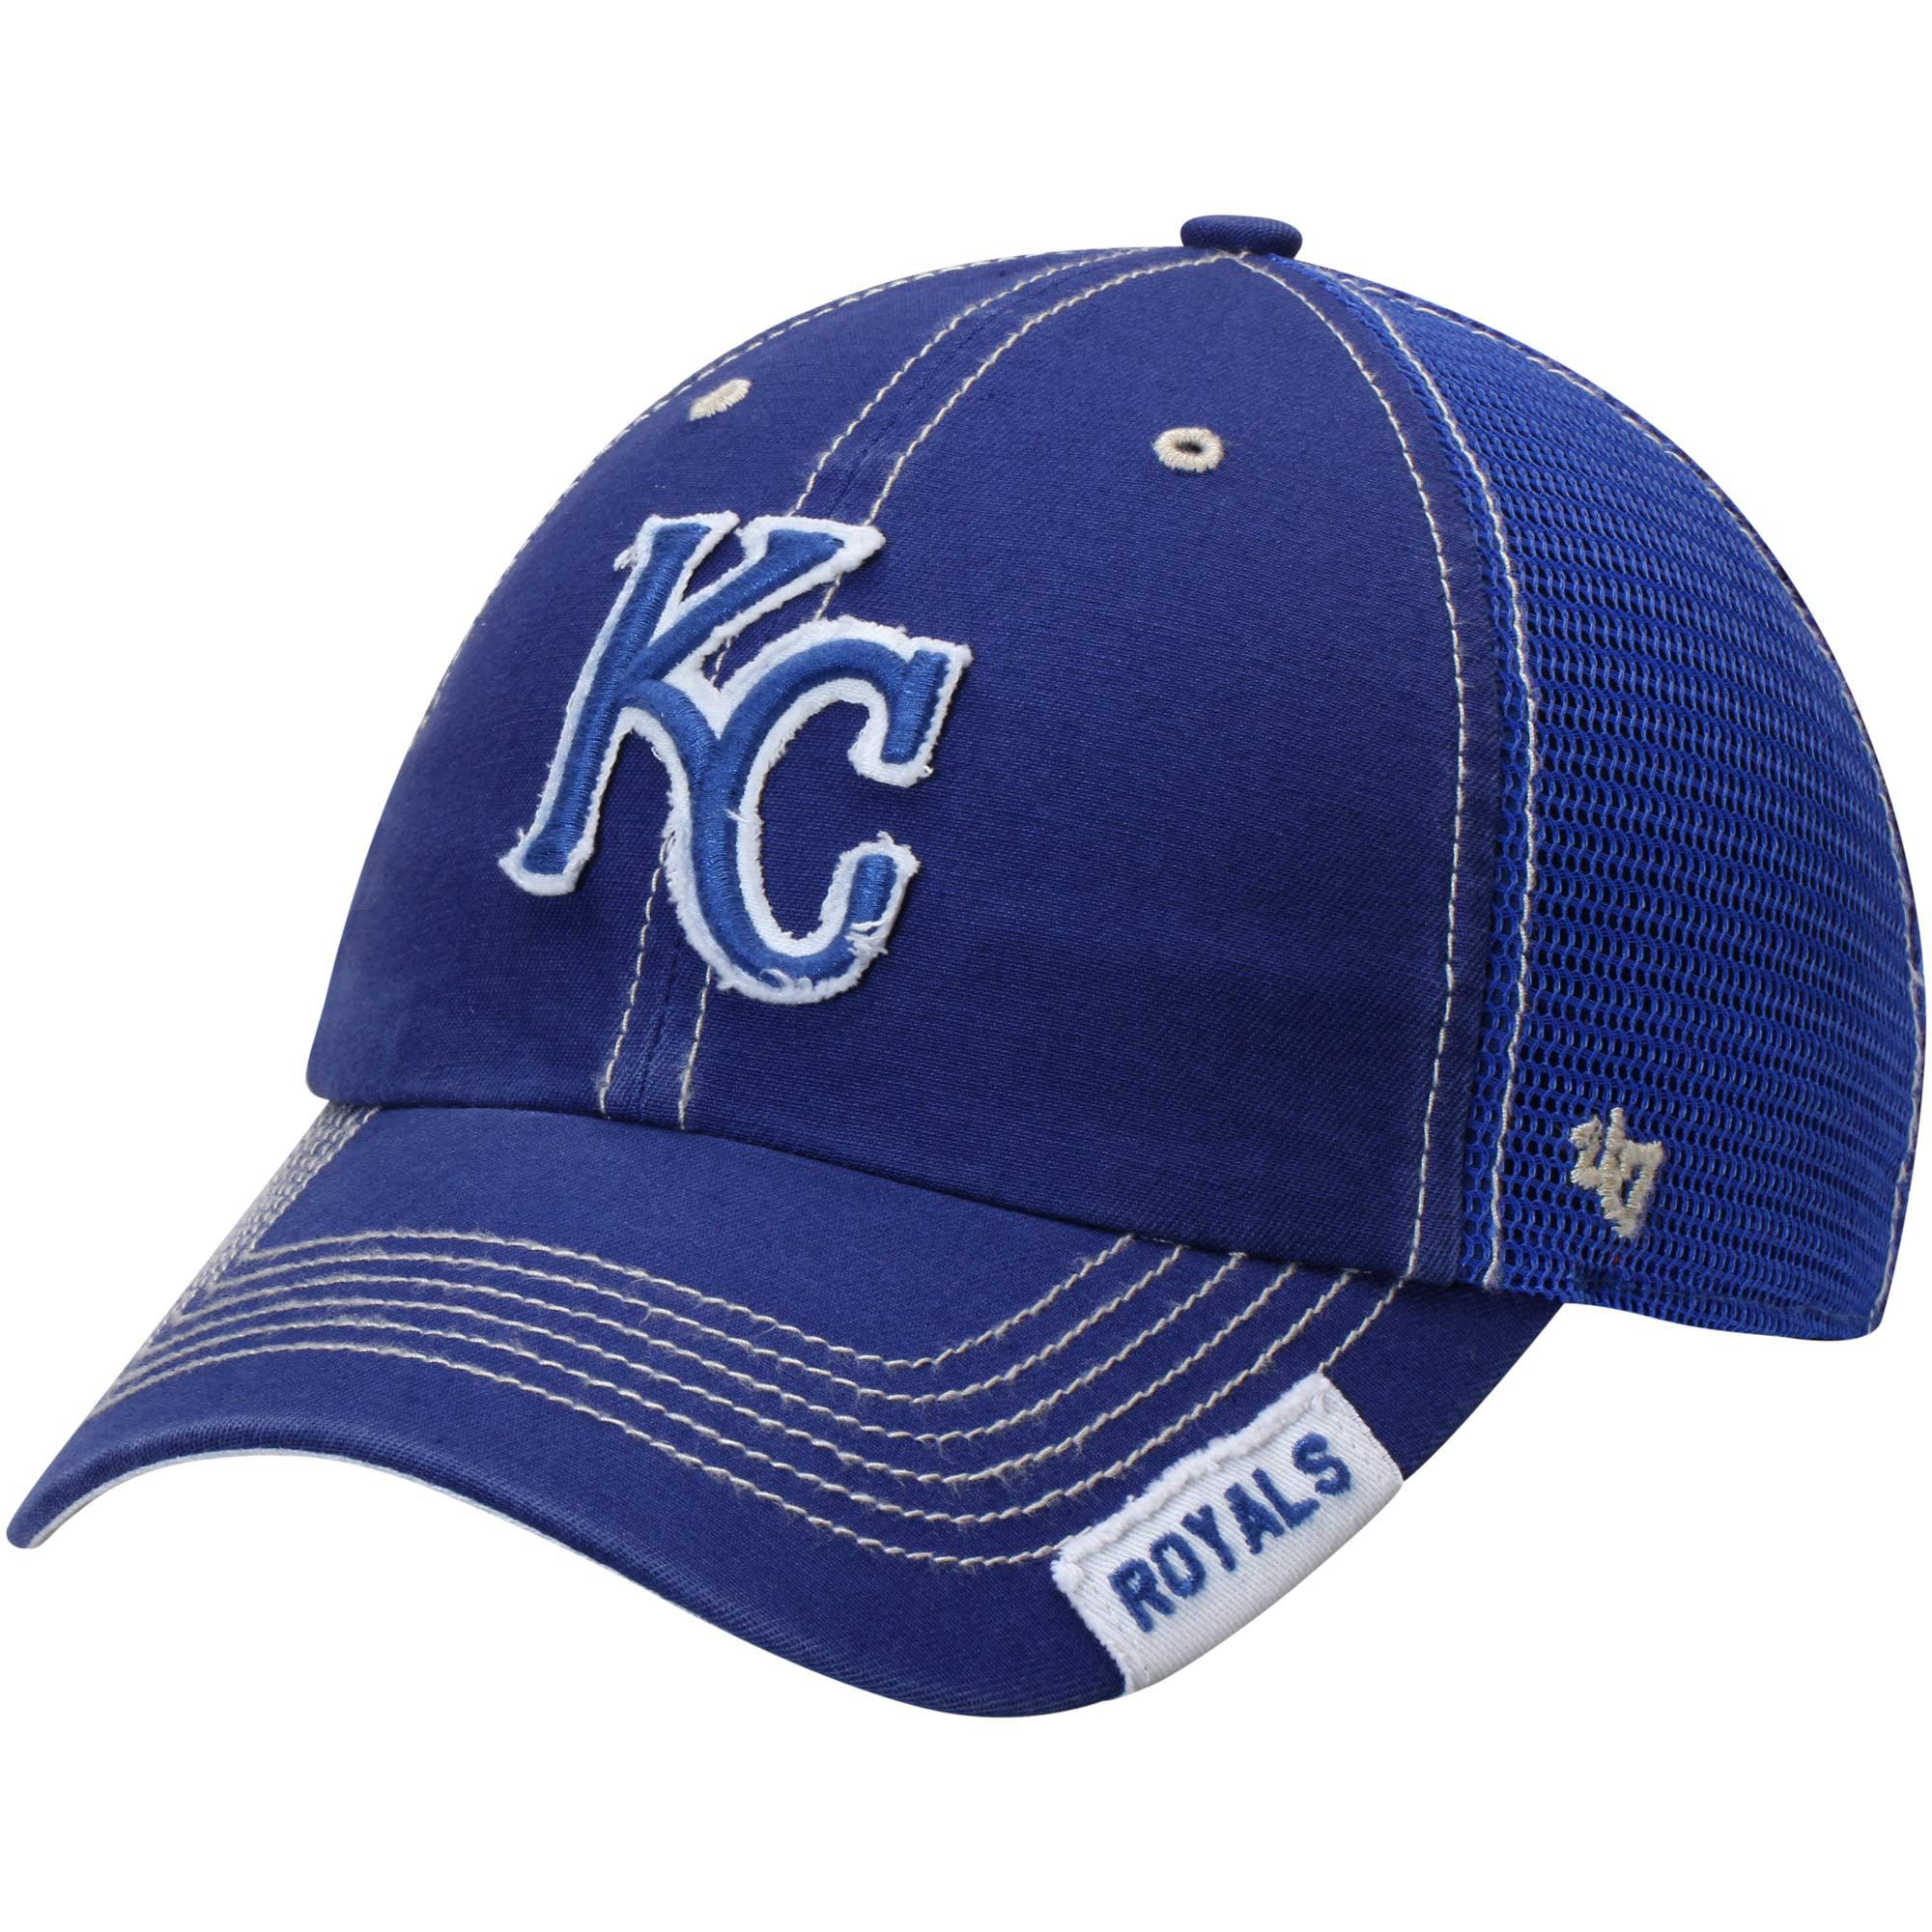 Kansas City Royals '47 Turner Clean-Up Adjustable Hat - Royal - OSFA